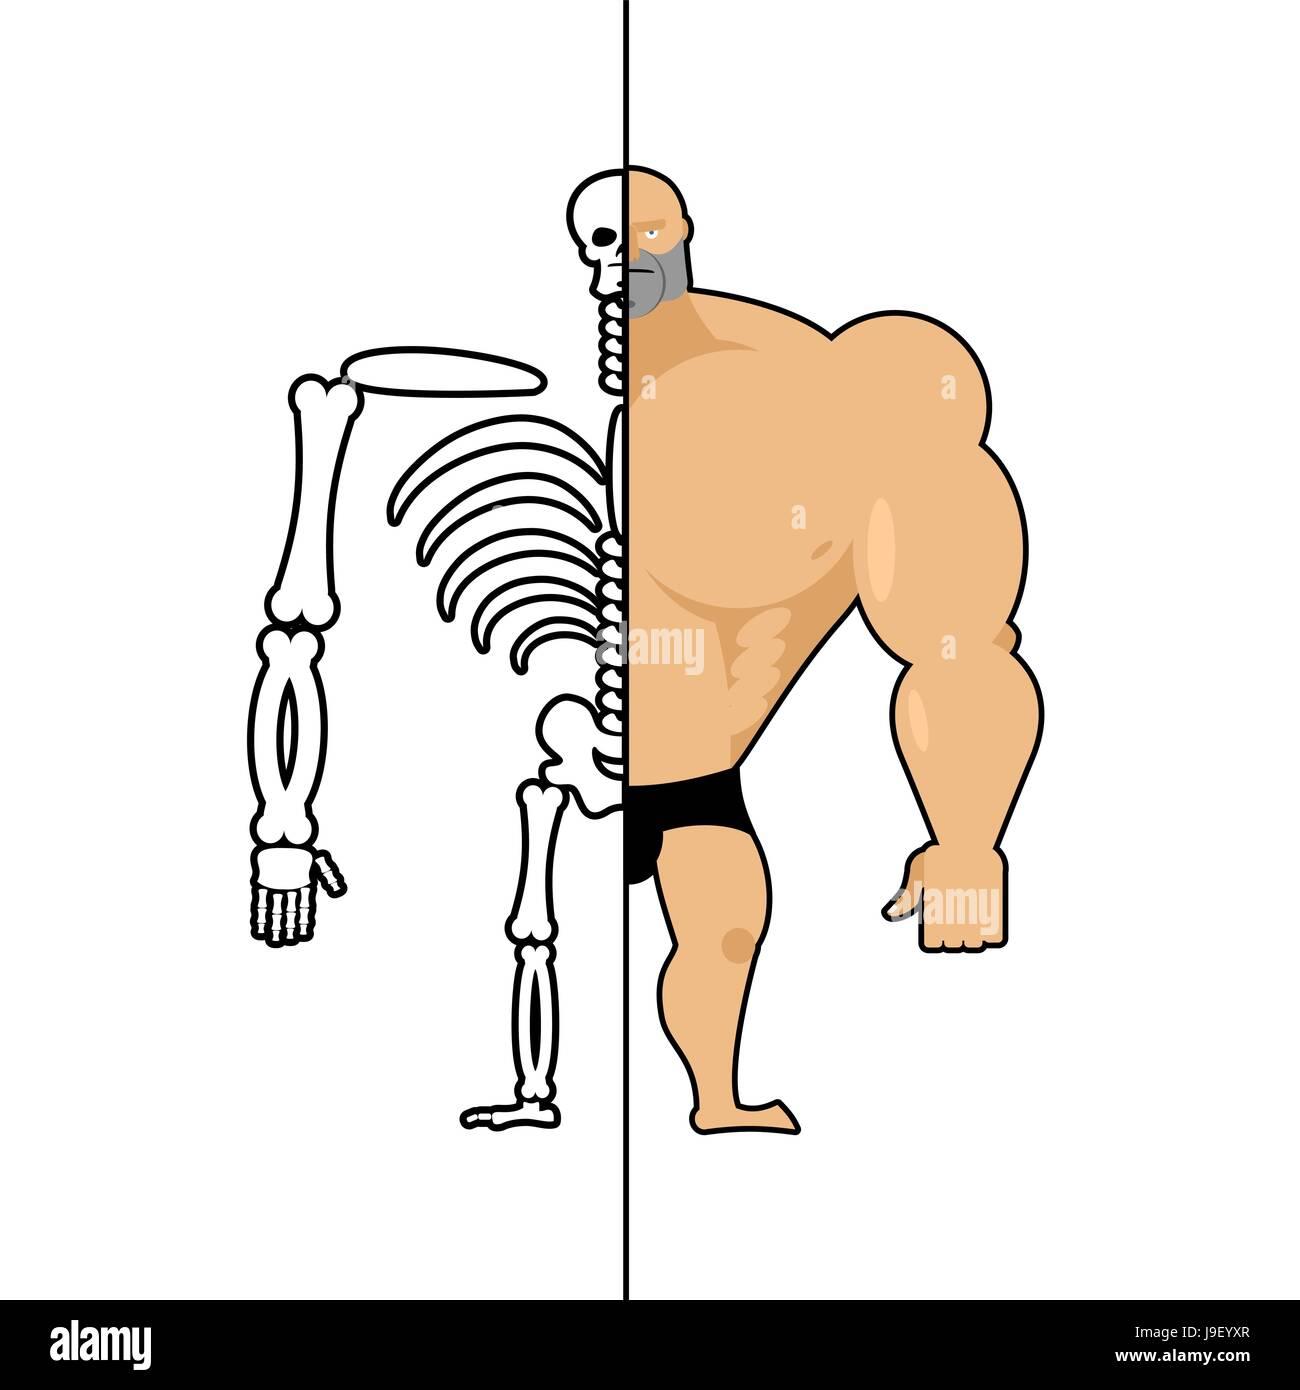 Human Structure Skeleton Men Anatomy Bodybuilder Construction Of